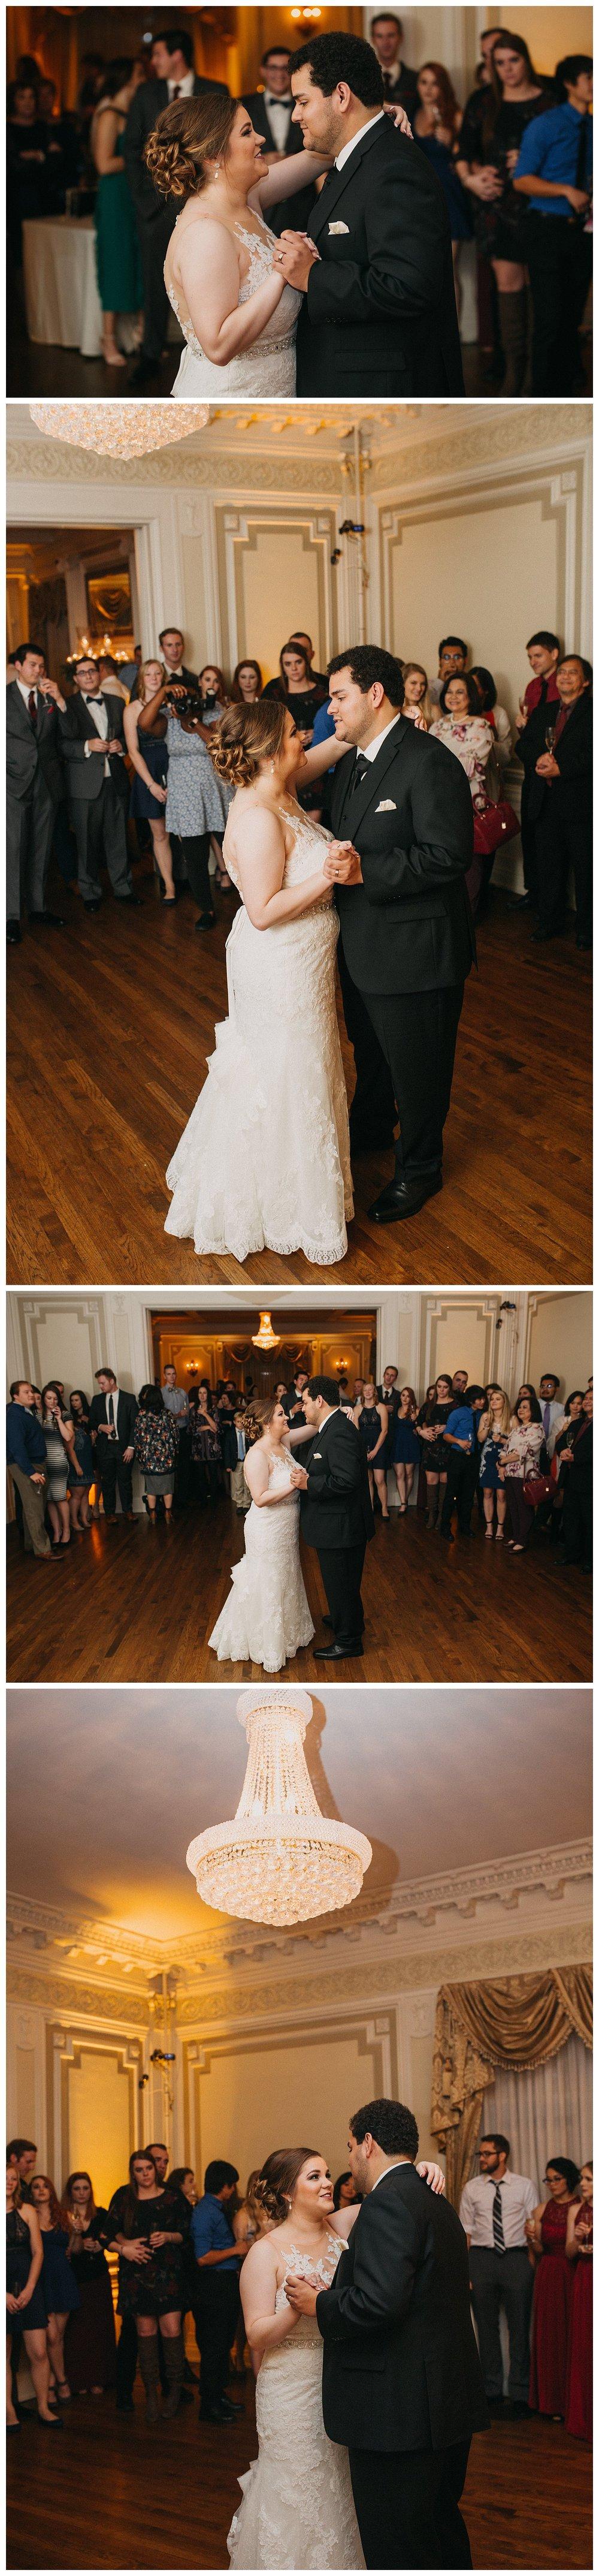 Kelsey_Diane_Photography_Loose_Mansion_Wedding_Photography_Kansas_City_Victor_Lyndsay_0165.jpg